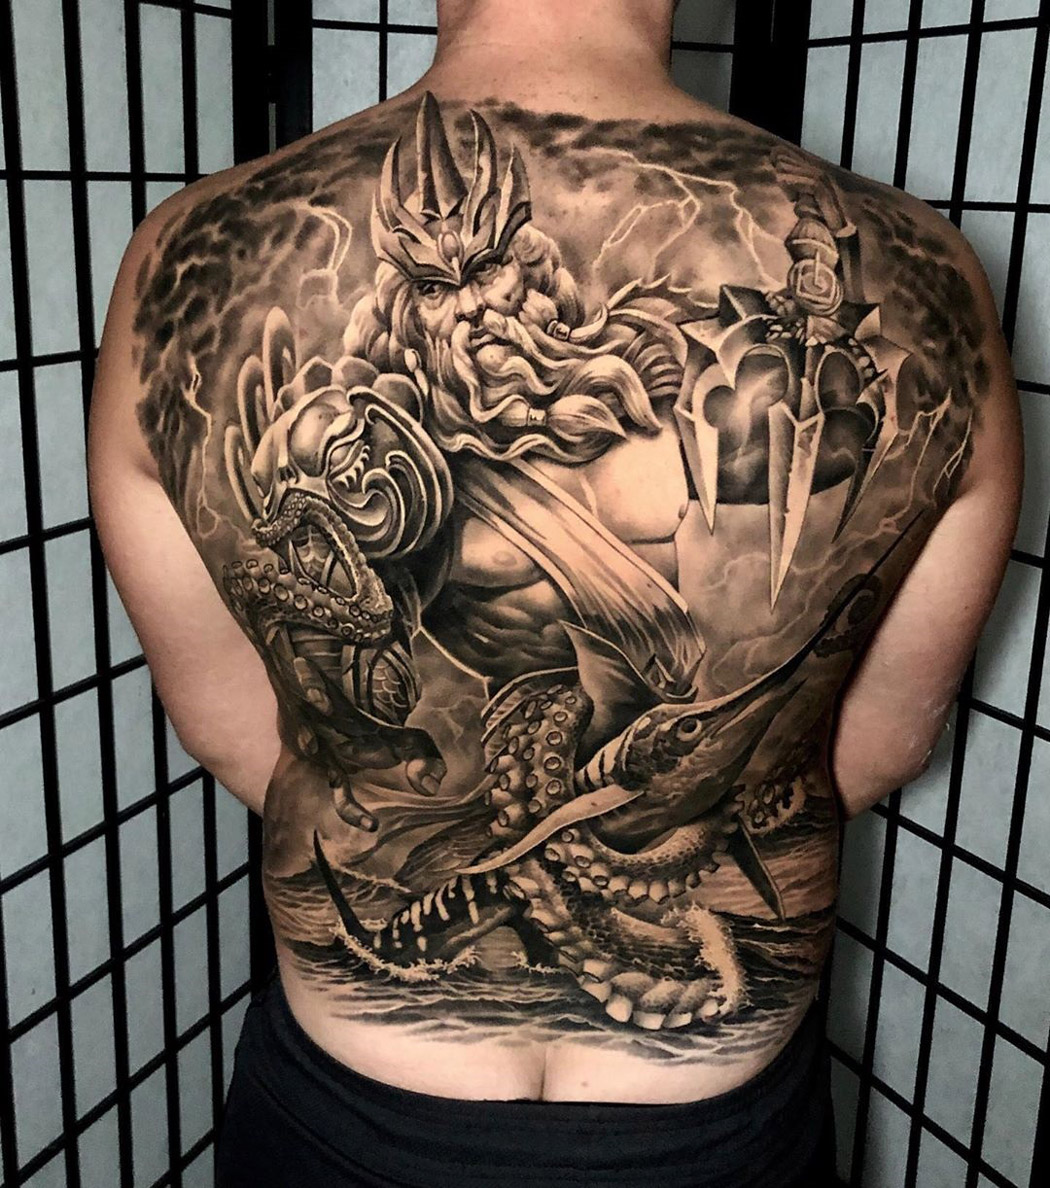 Poseidon Full Back Tattoo Best Tattoo Design Ideas